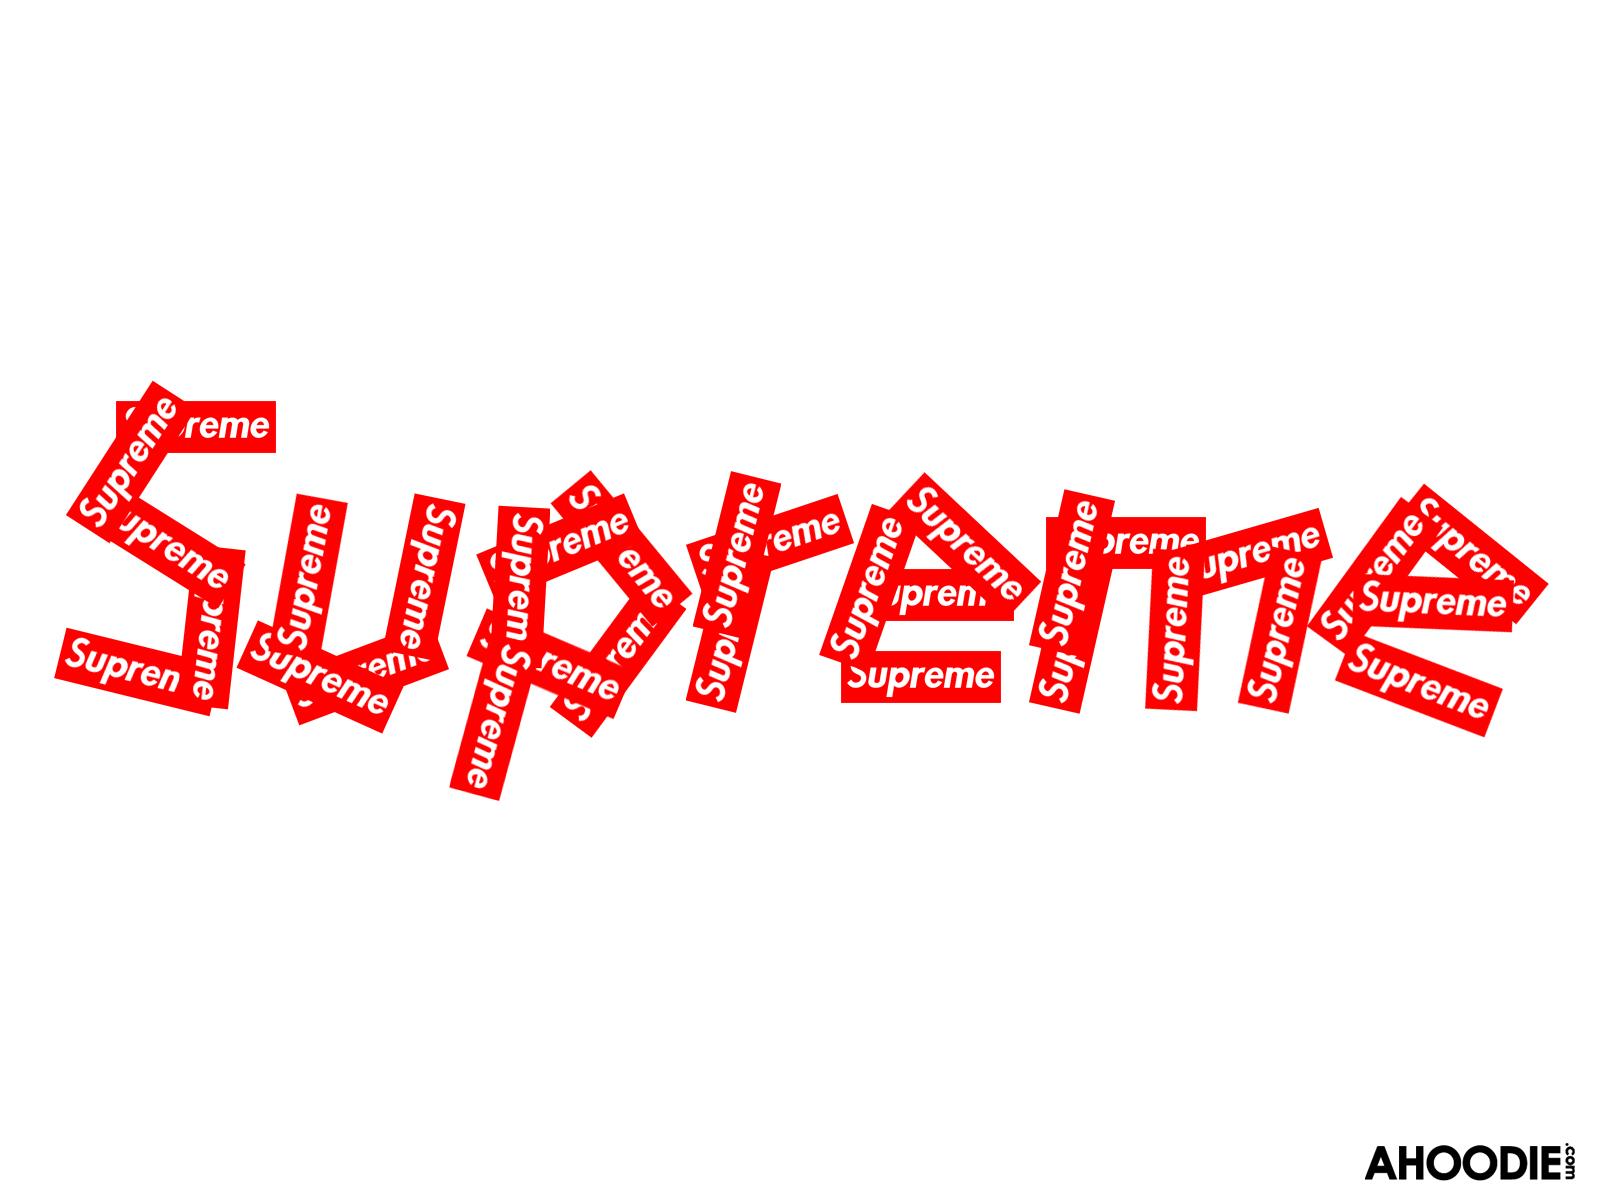 supreme - photo #6